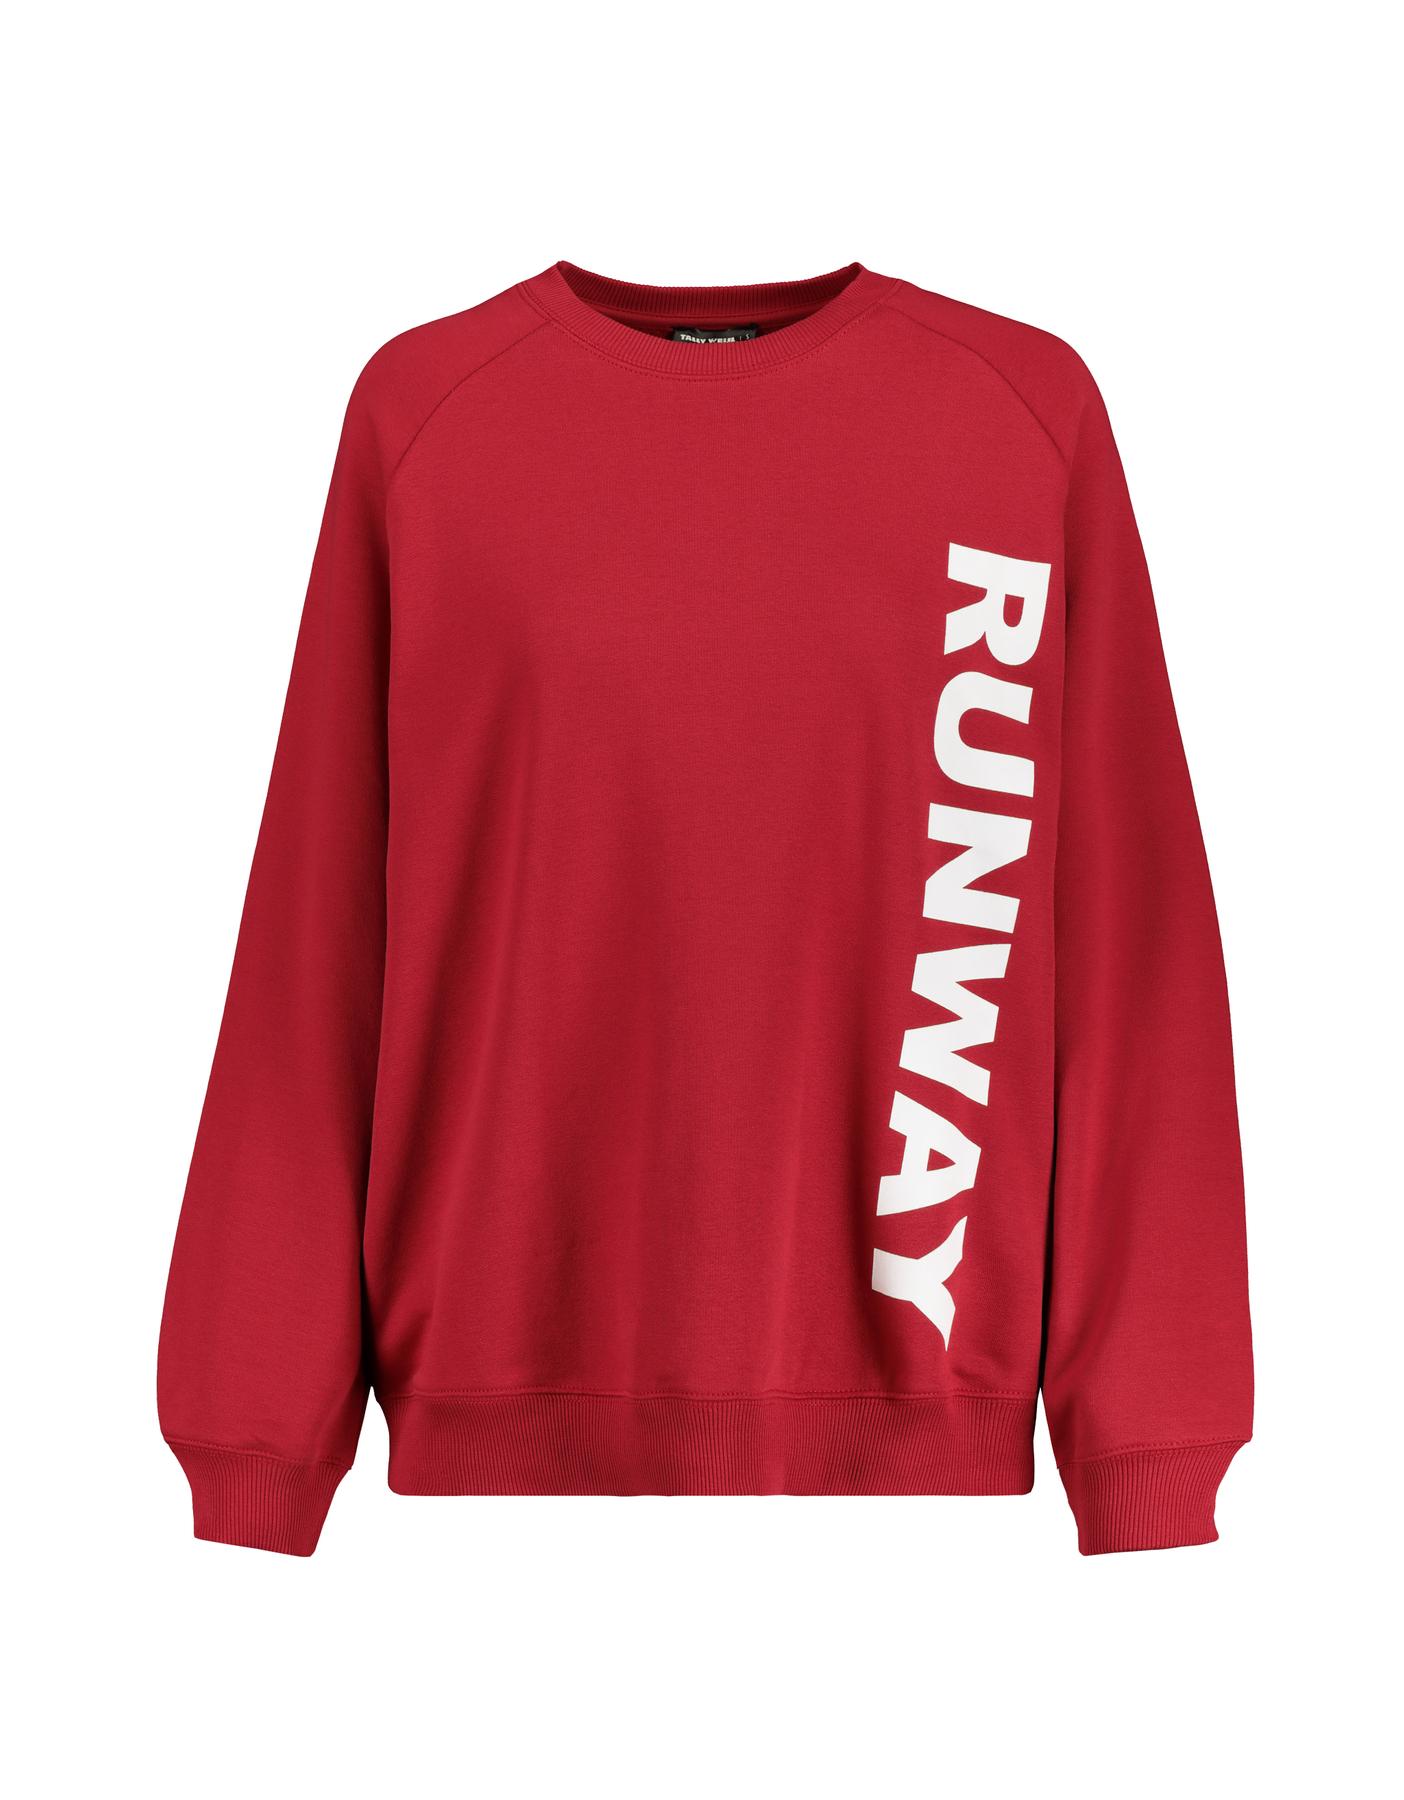 Red Oversized Sweatshirt